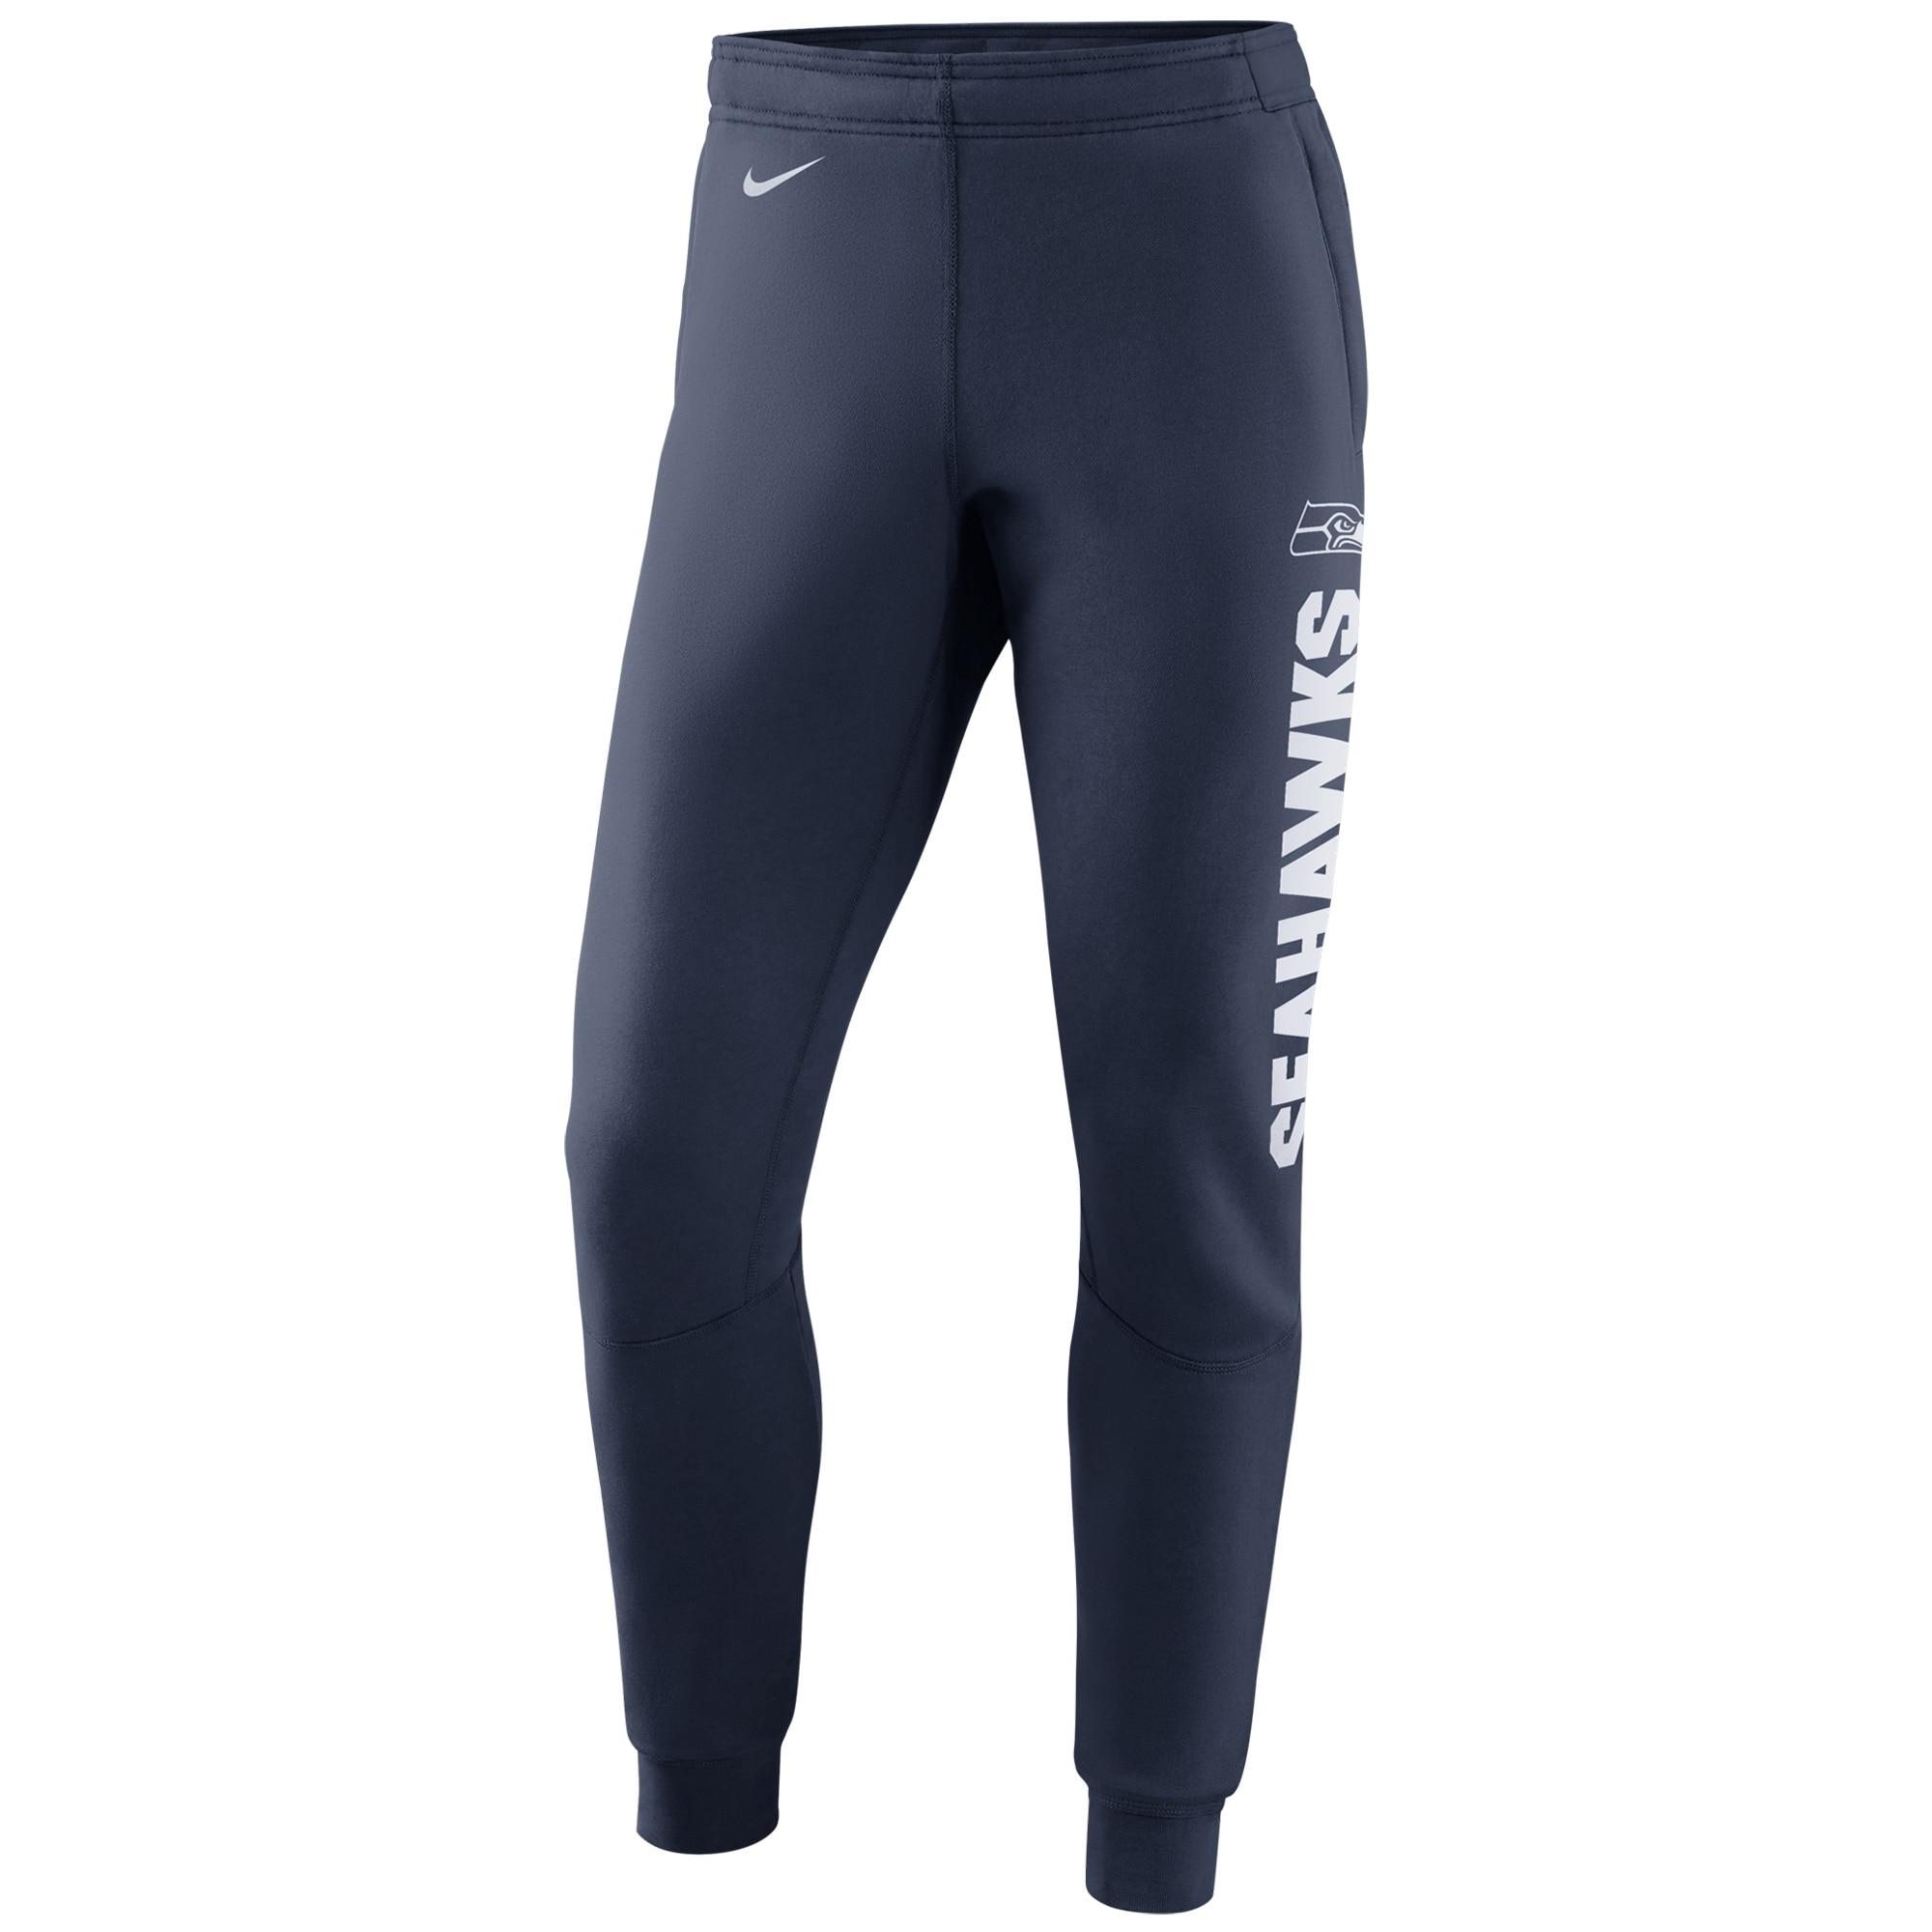 Seattle Seahawks Nike Stadium Pants - College Navy